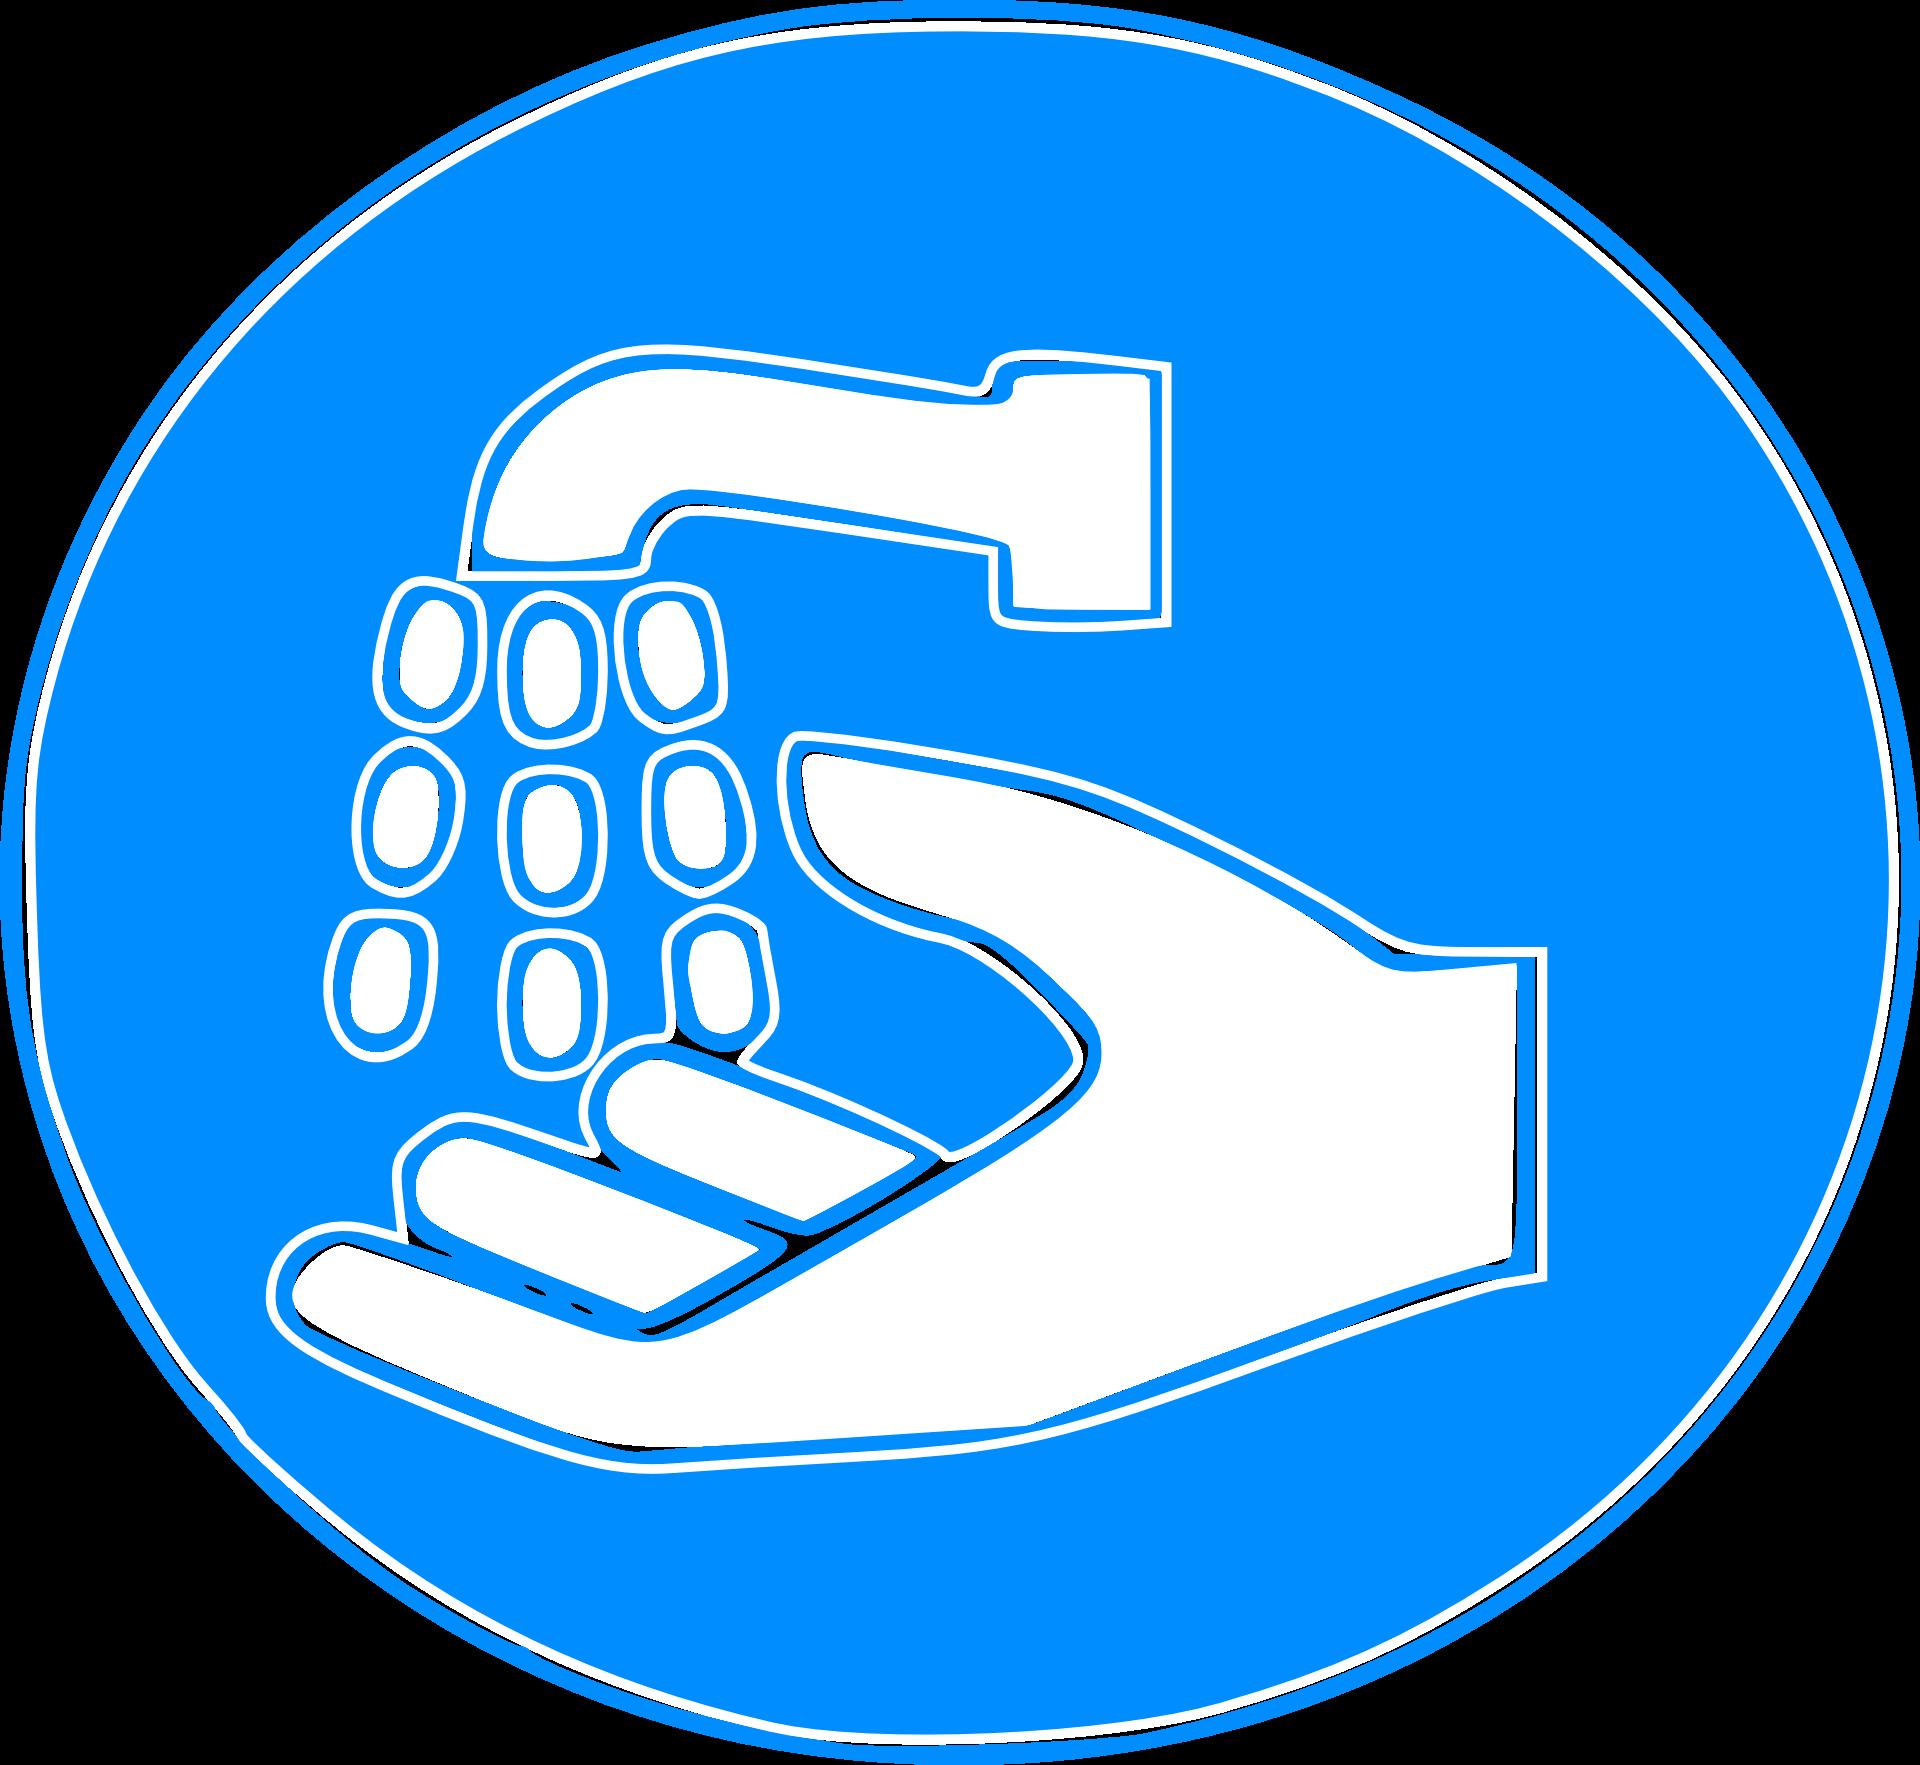 Käsienpesu kyltti